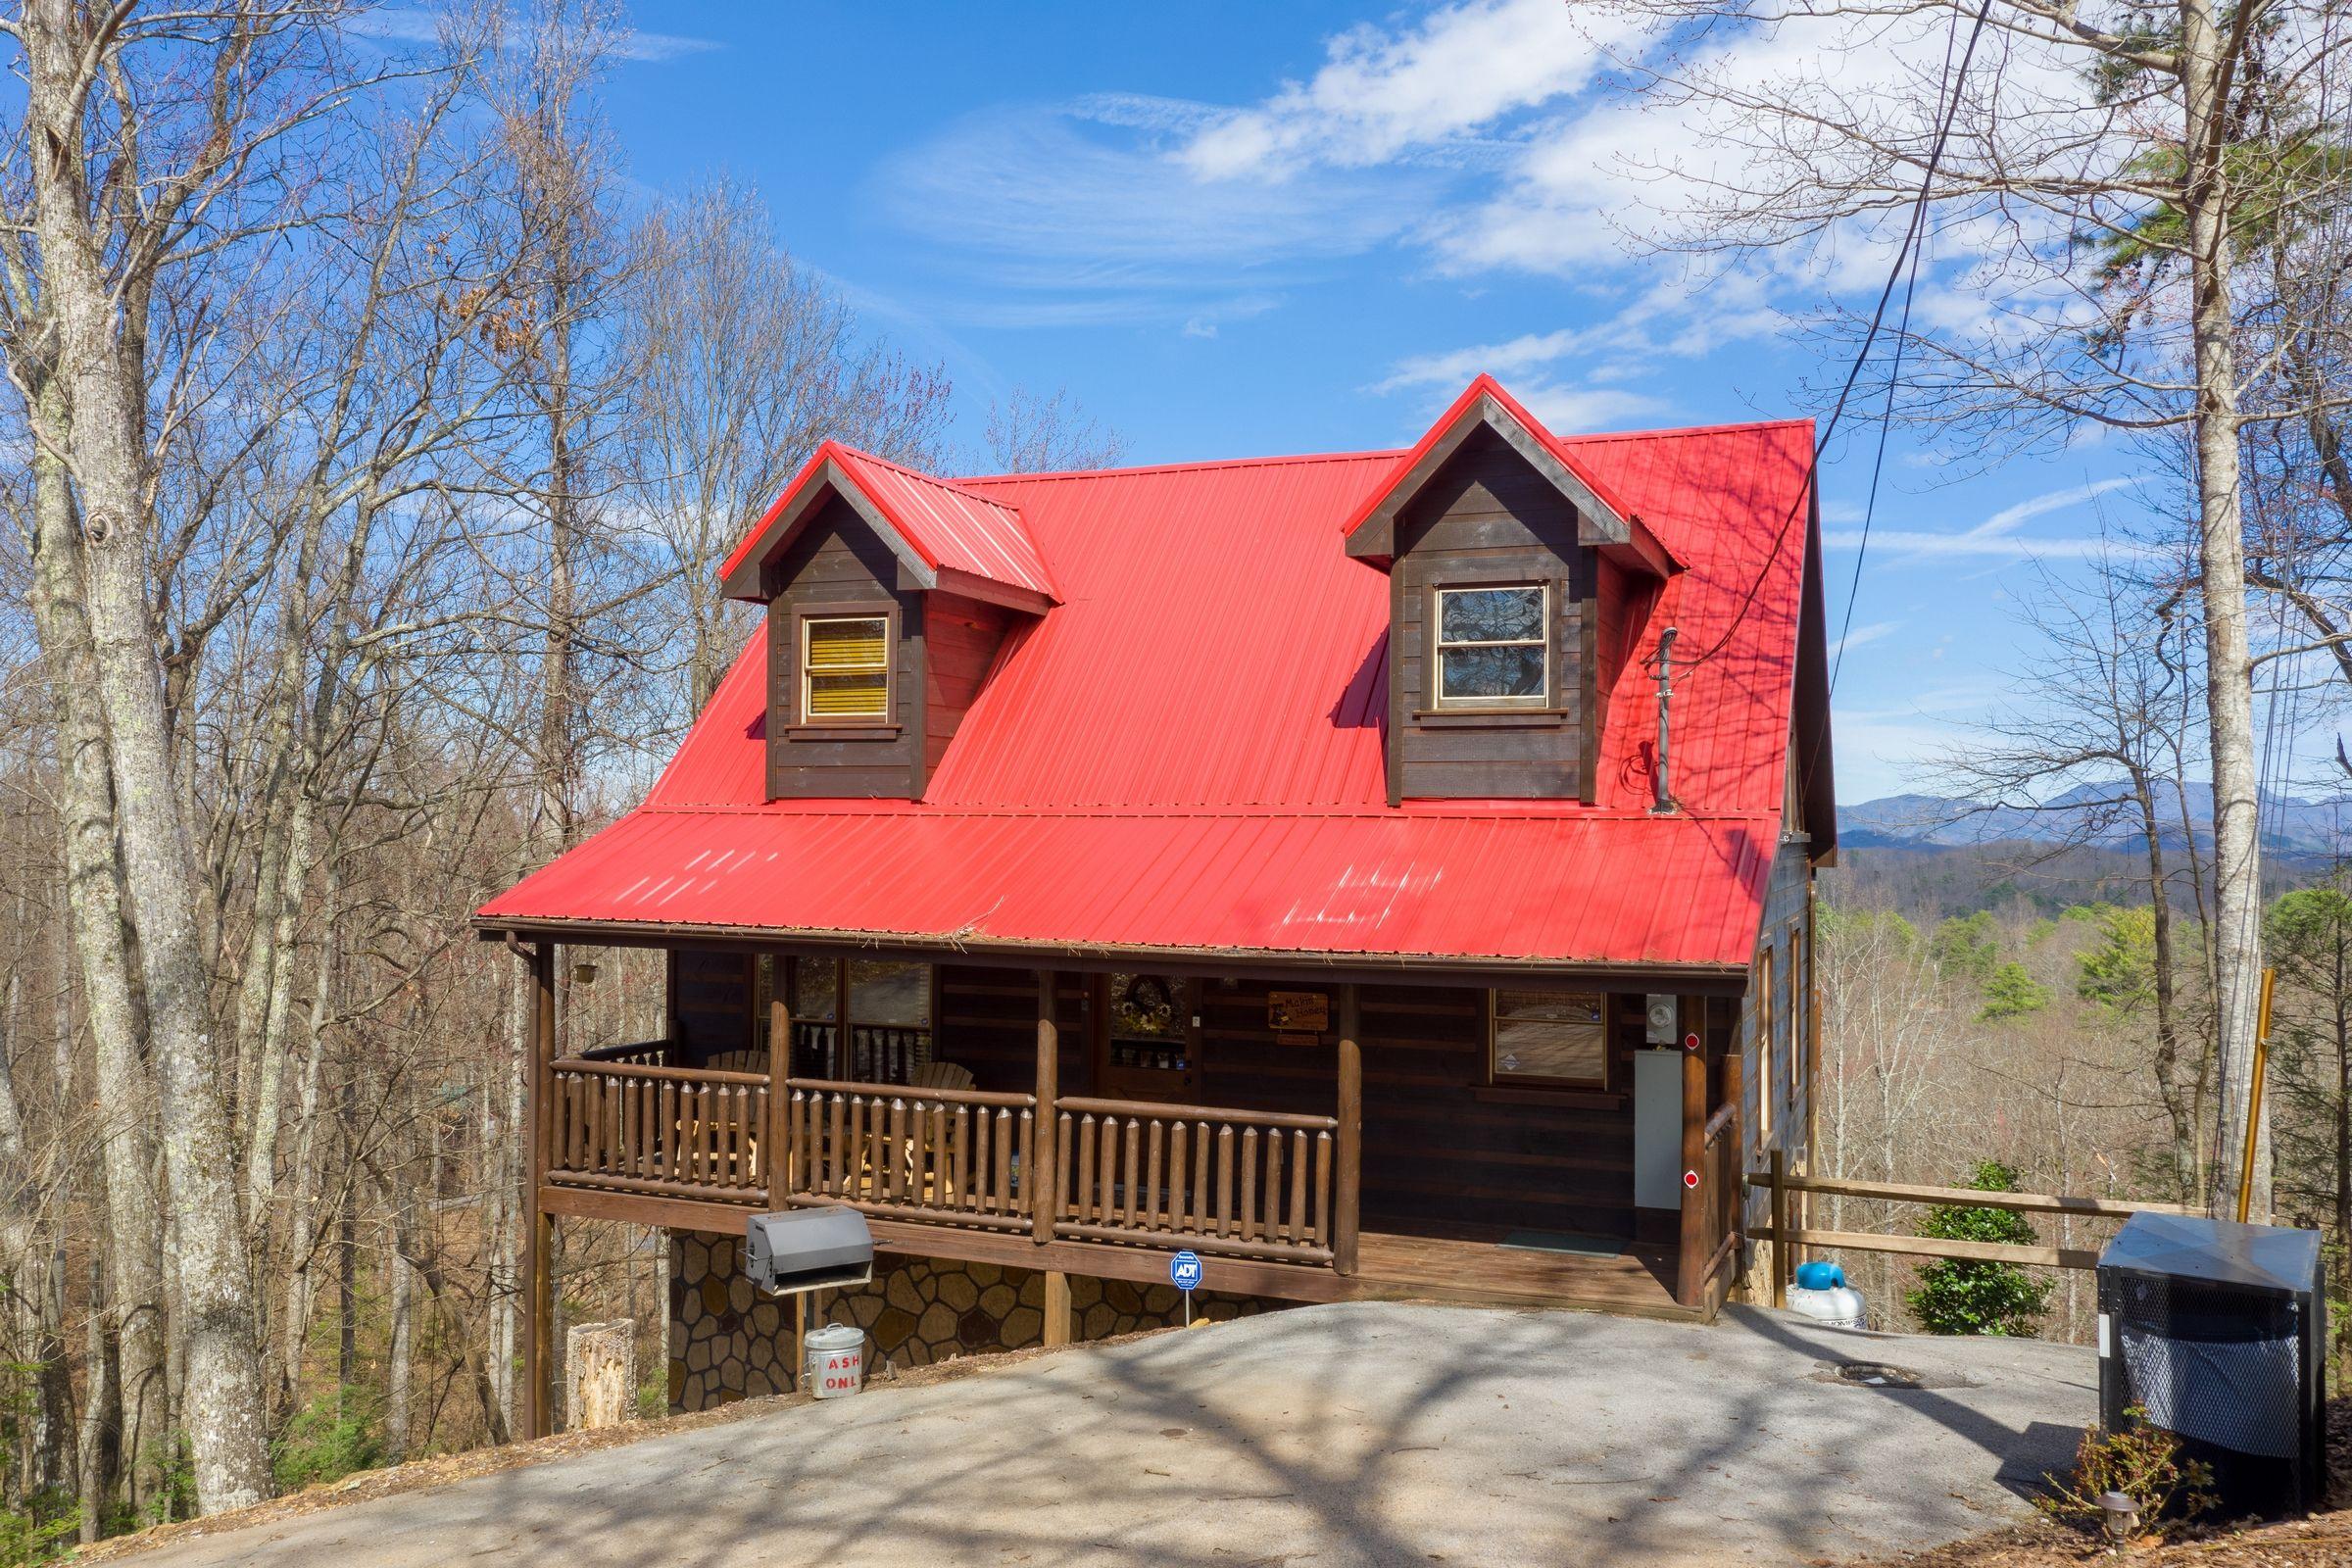 Makin Honey Luxury Plus 1 Bedroom Pigeon Forge Cabin Rental Pigeon Forge Cabin Rentals Cabin Gatlinburg Cabin Rentals